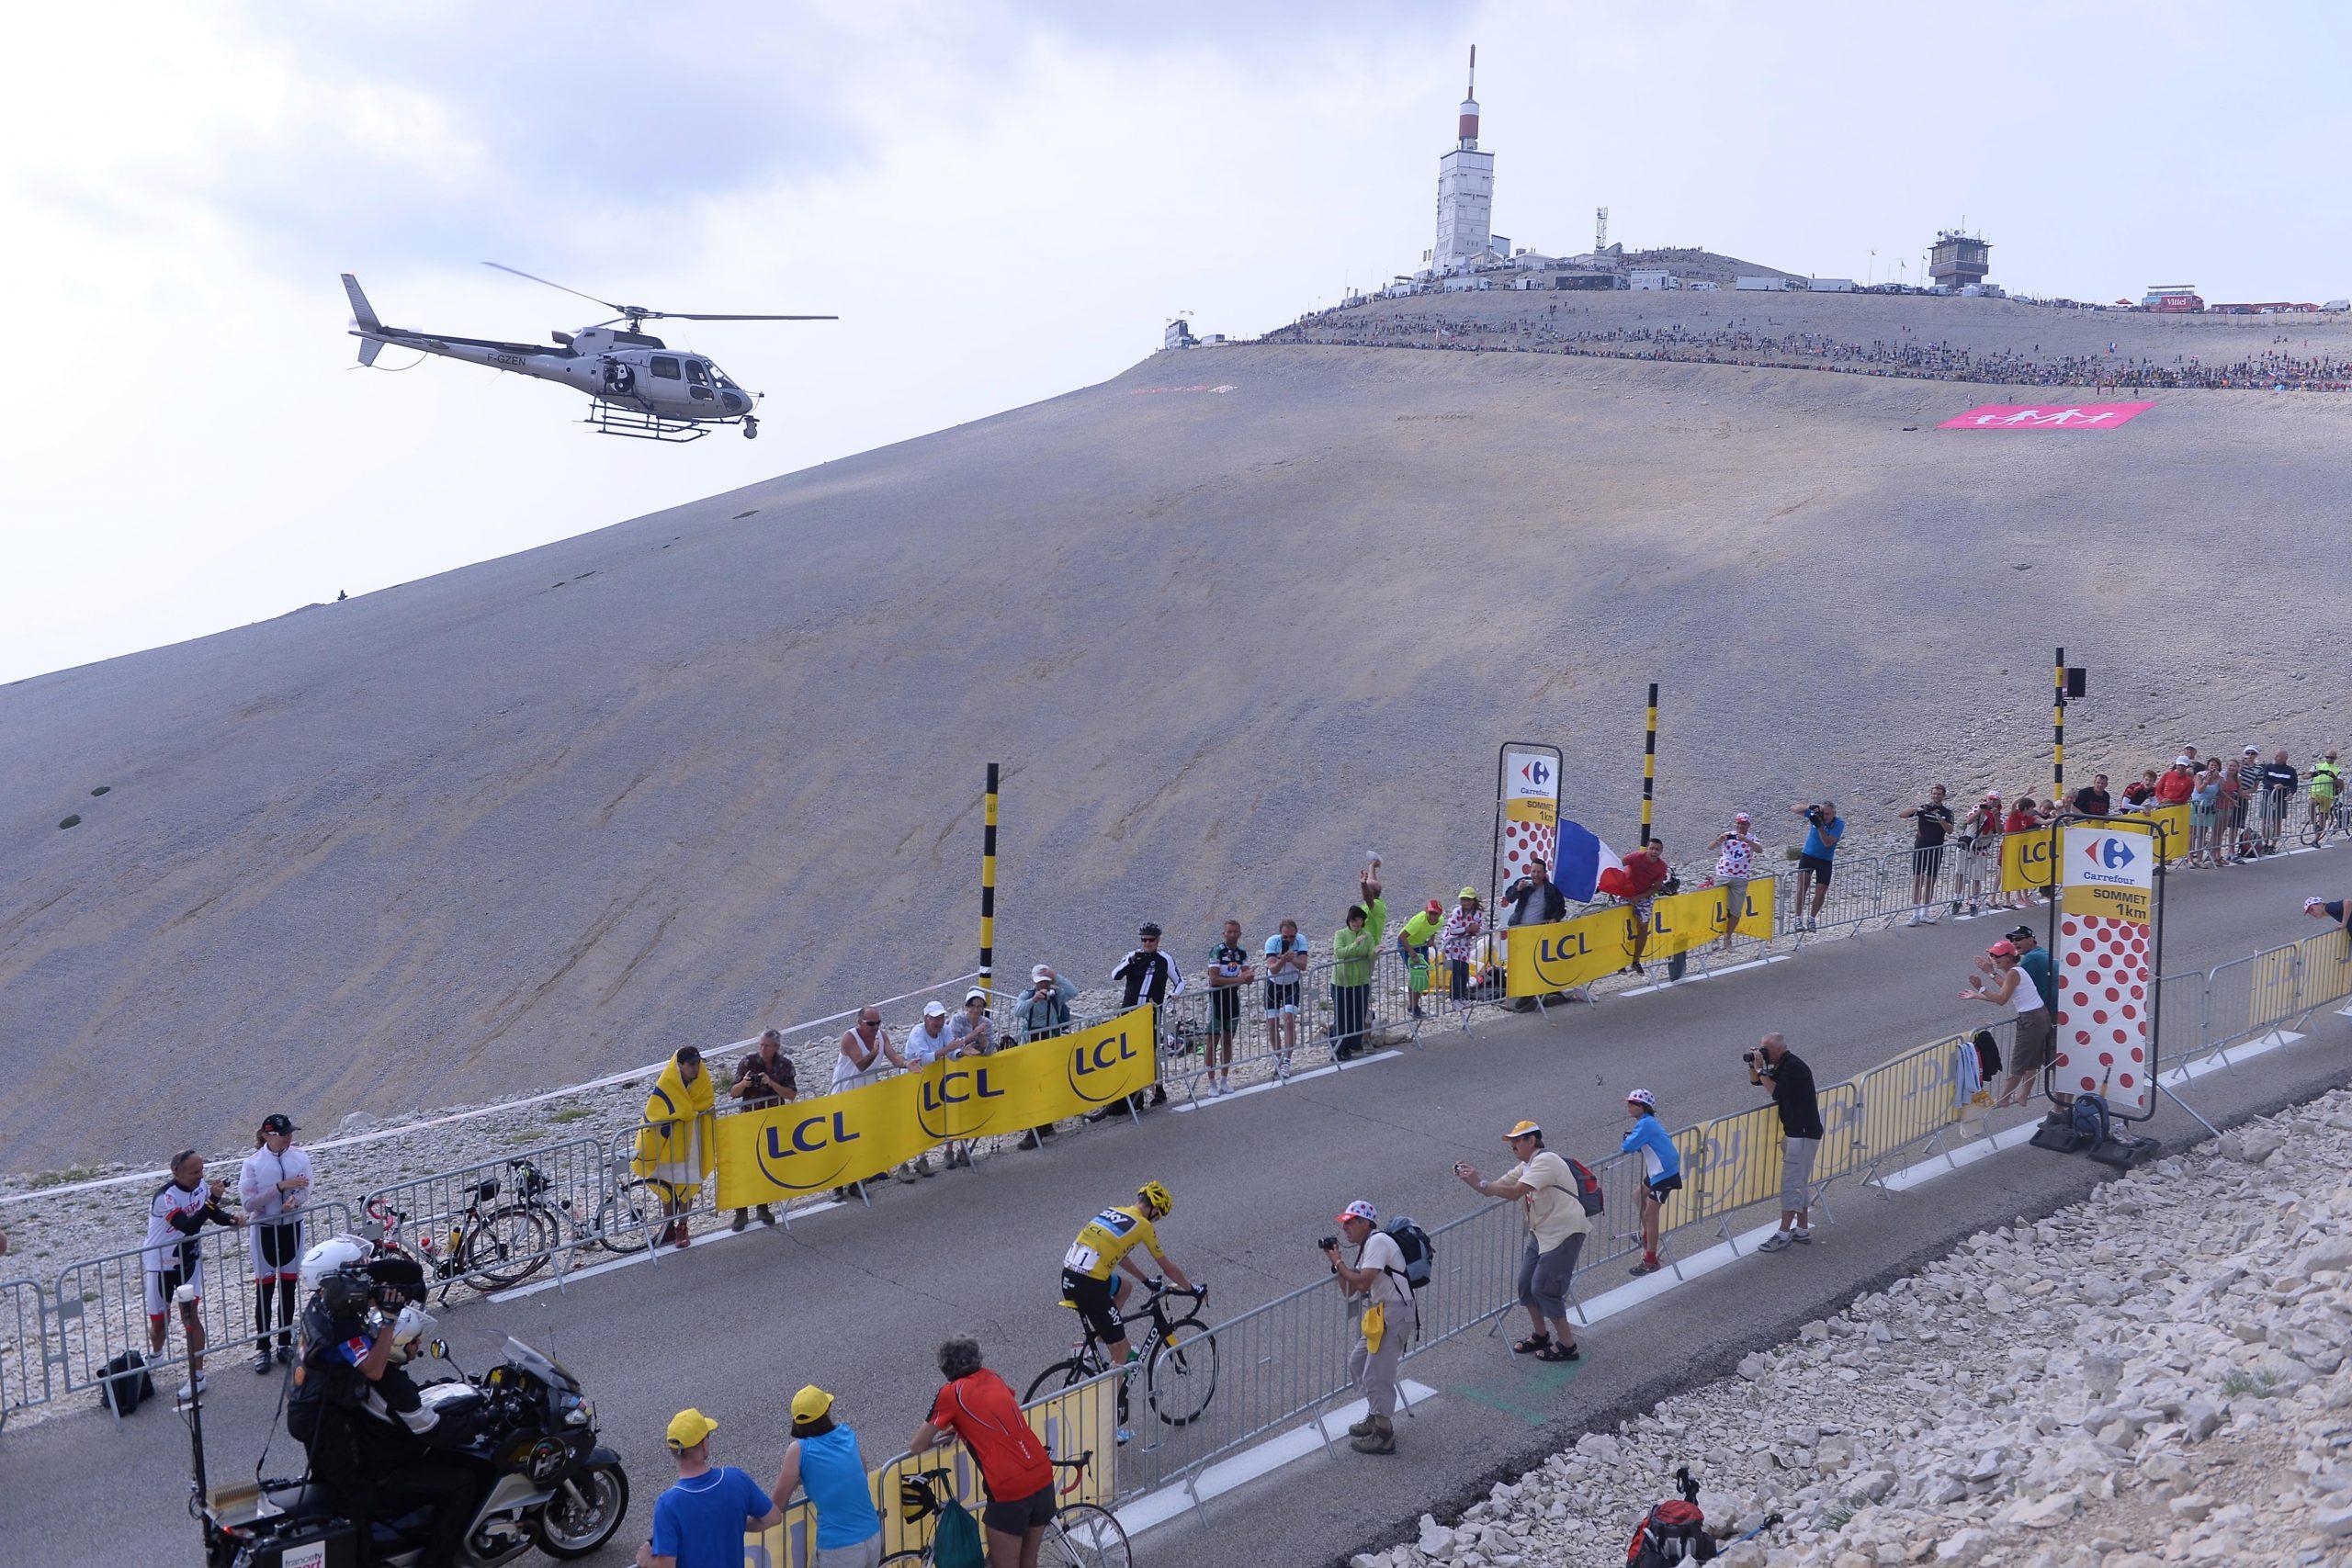 TdF-analyse: Hva venter i fjellene?